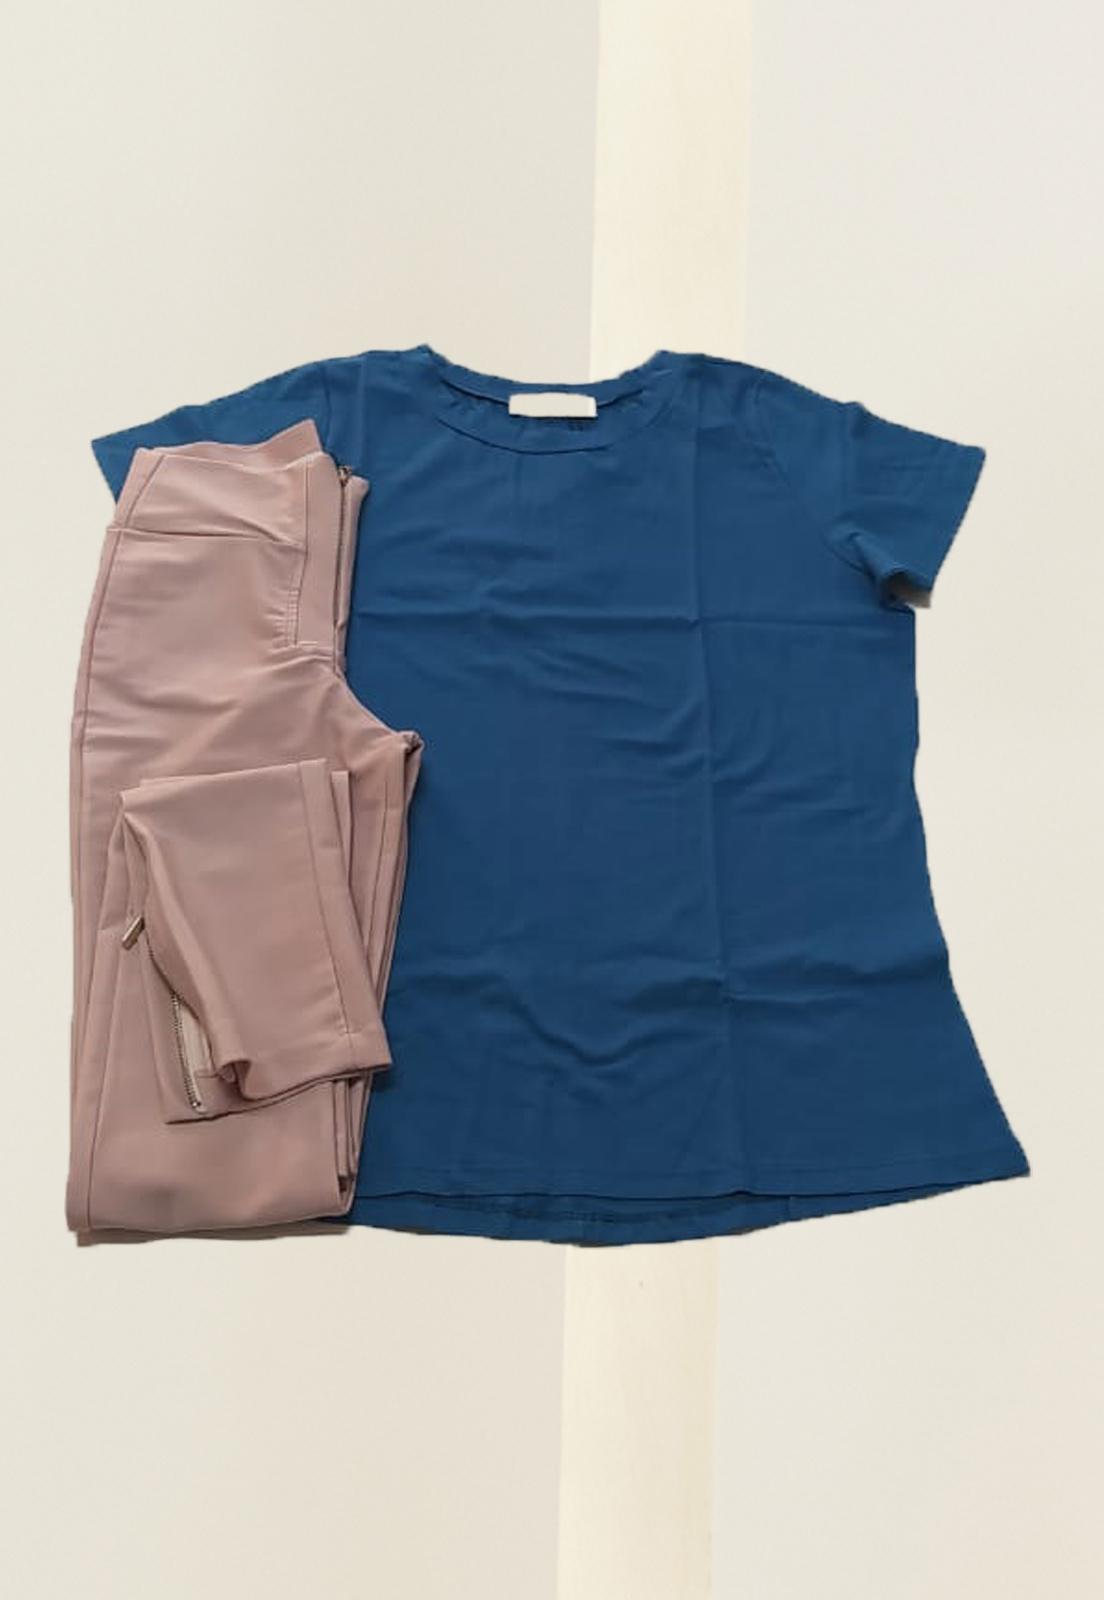 T-shirt Bia Azul + Calça Basic Prada Rosê